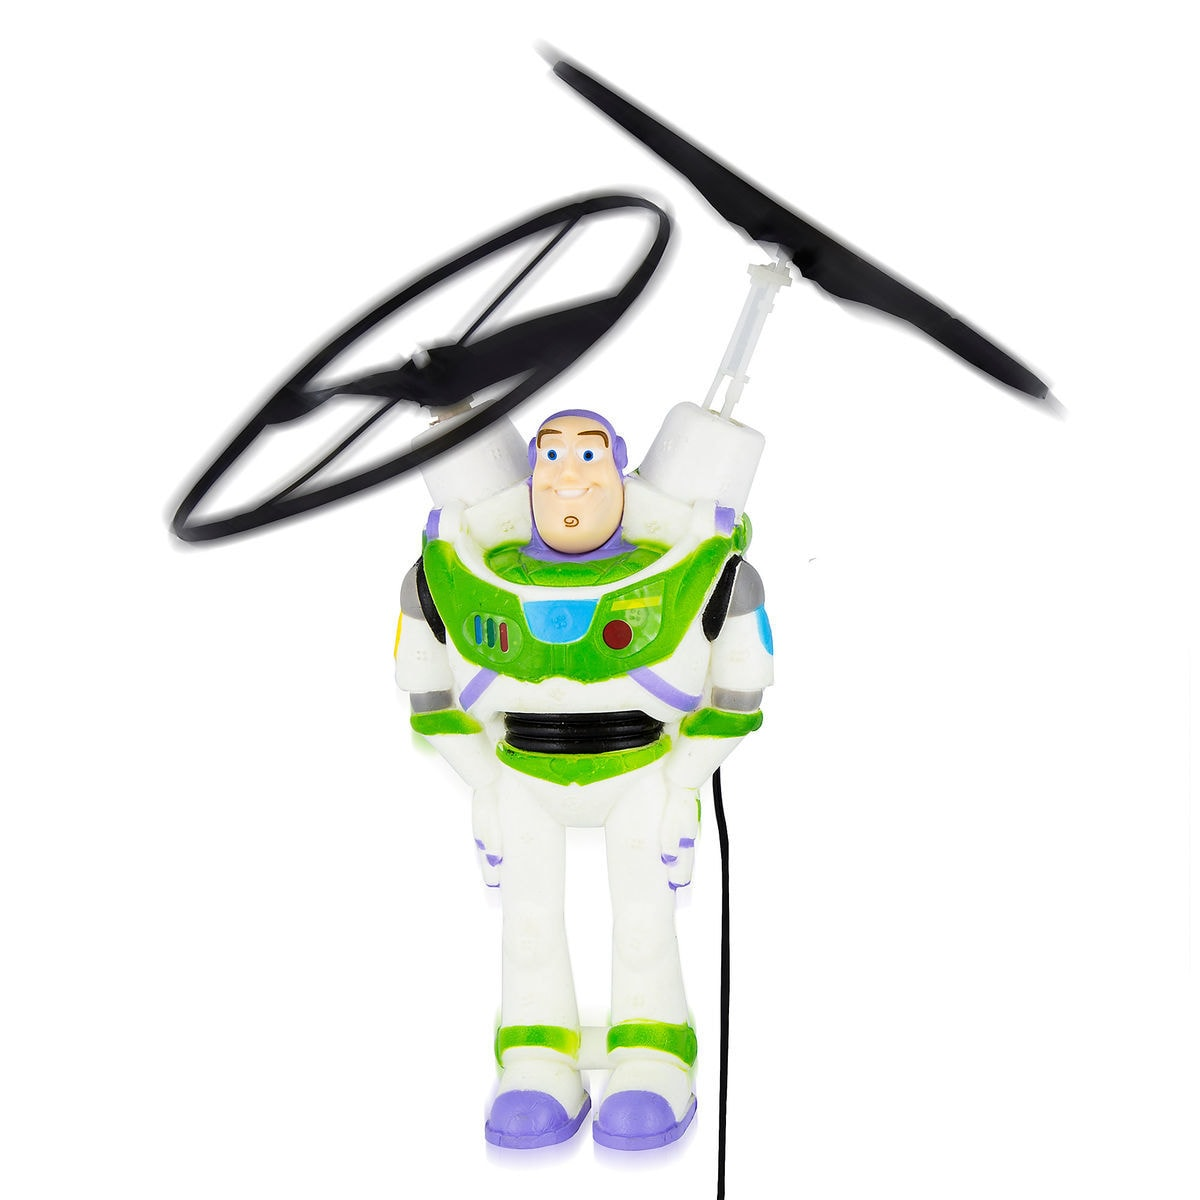 buzz lightyear flying action figure shopdisney